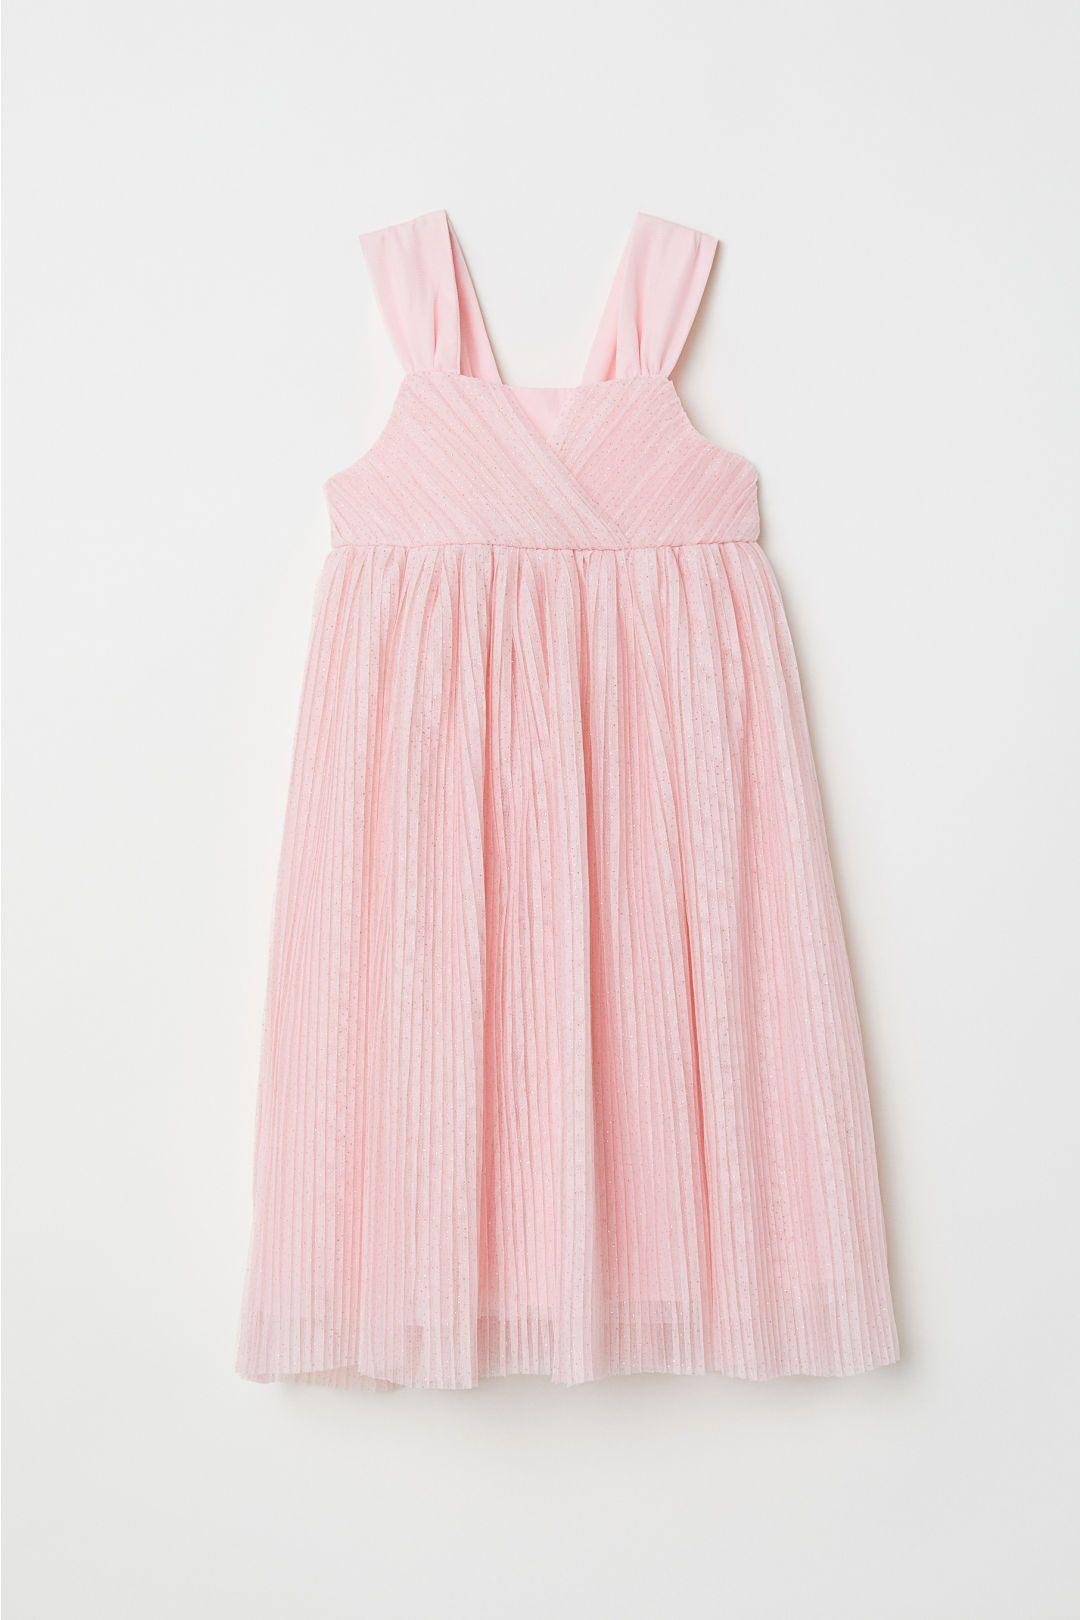 1c88e7615 H&M Glittery Mesh Dress - Pink   Swimsuit Swimwear Bodysuit Bikini ...